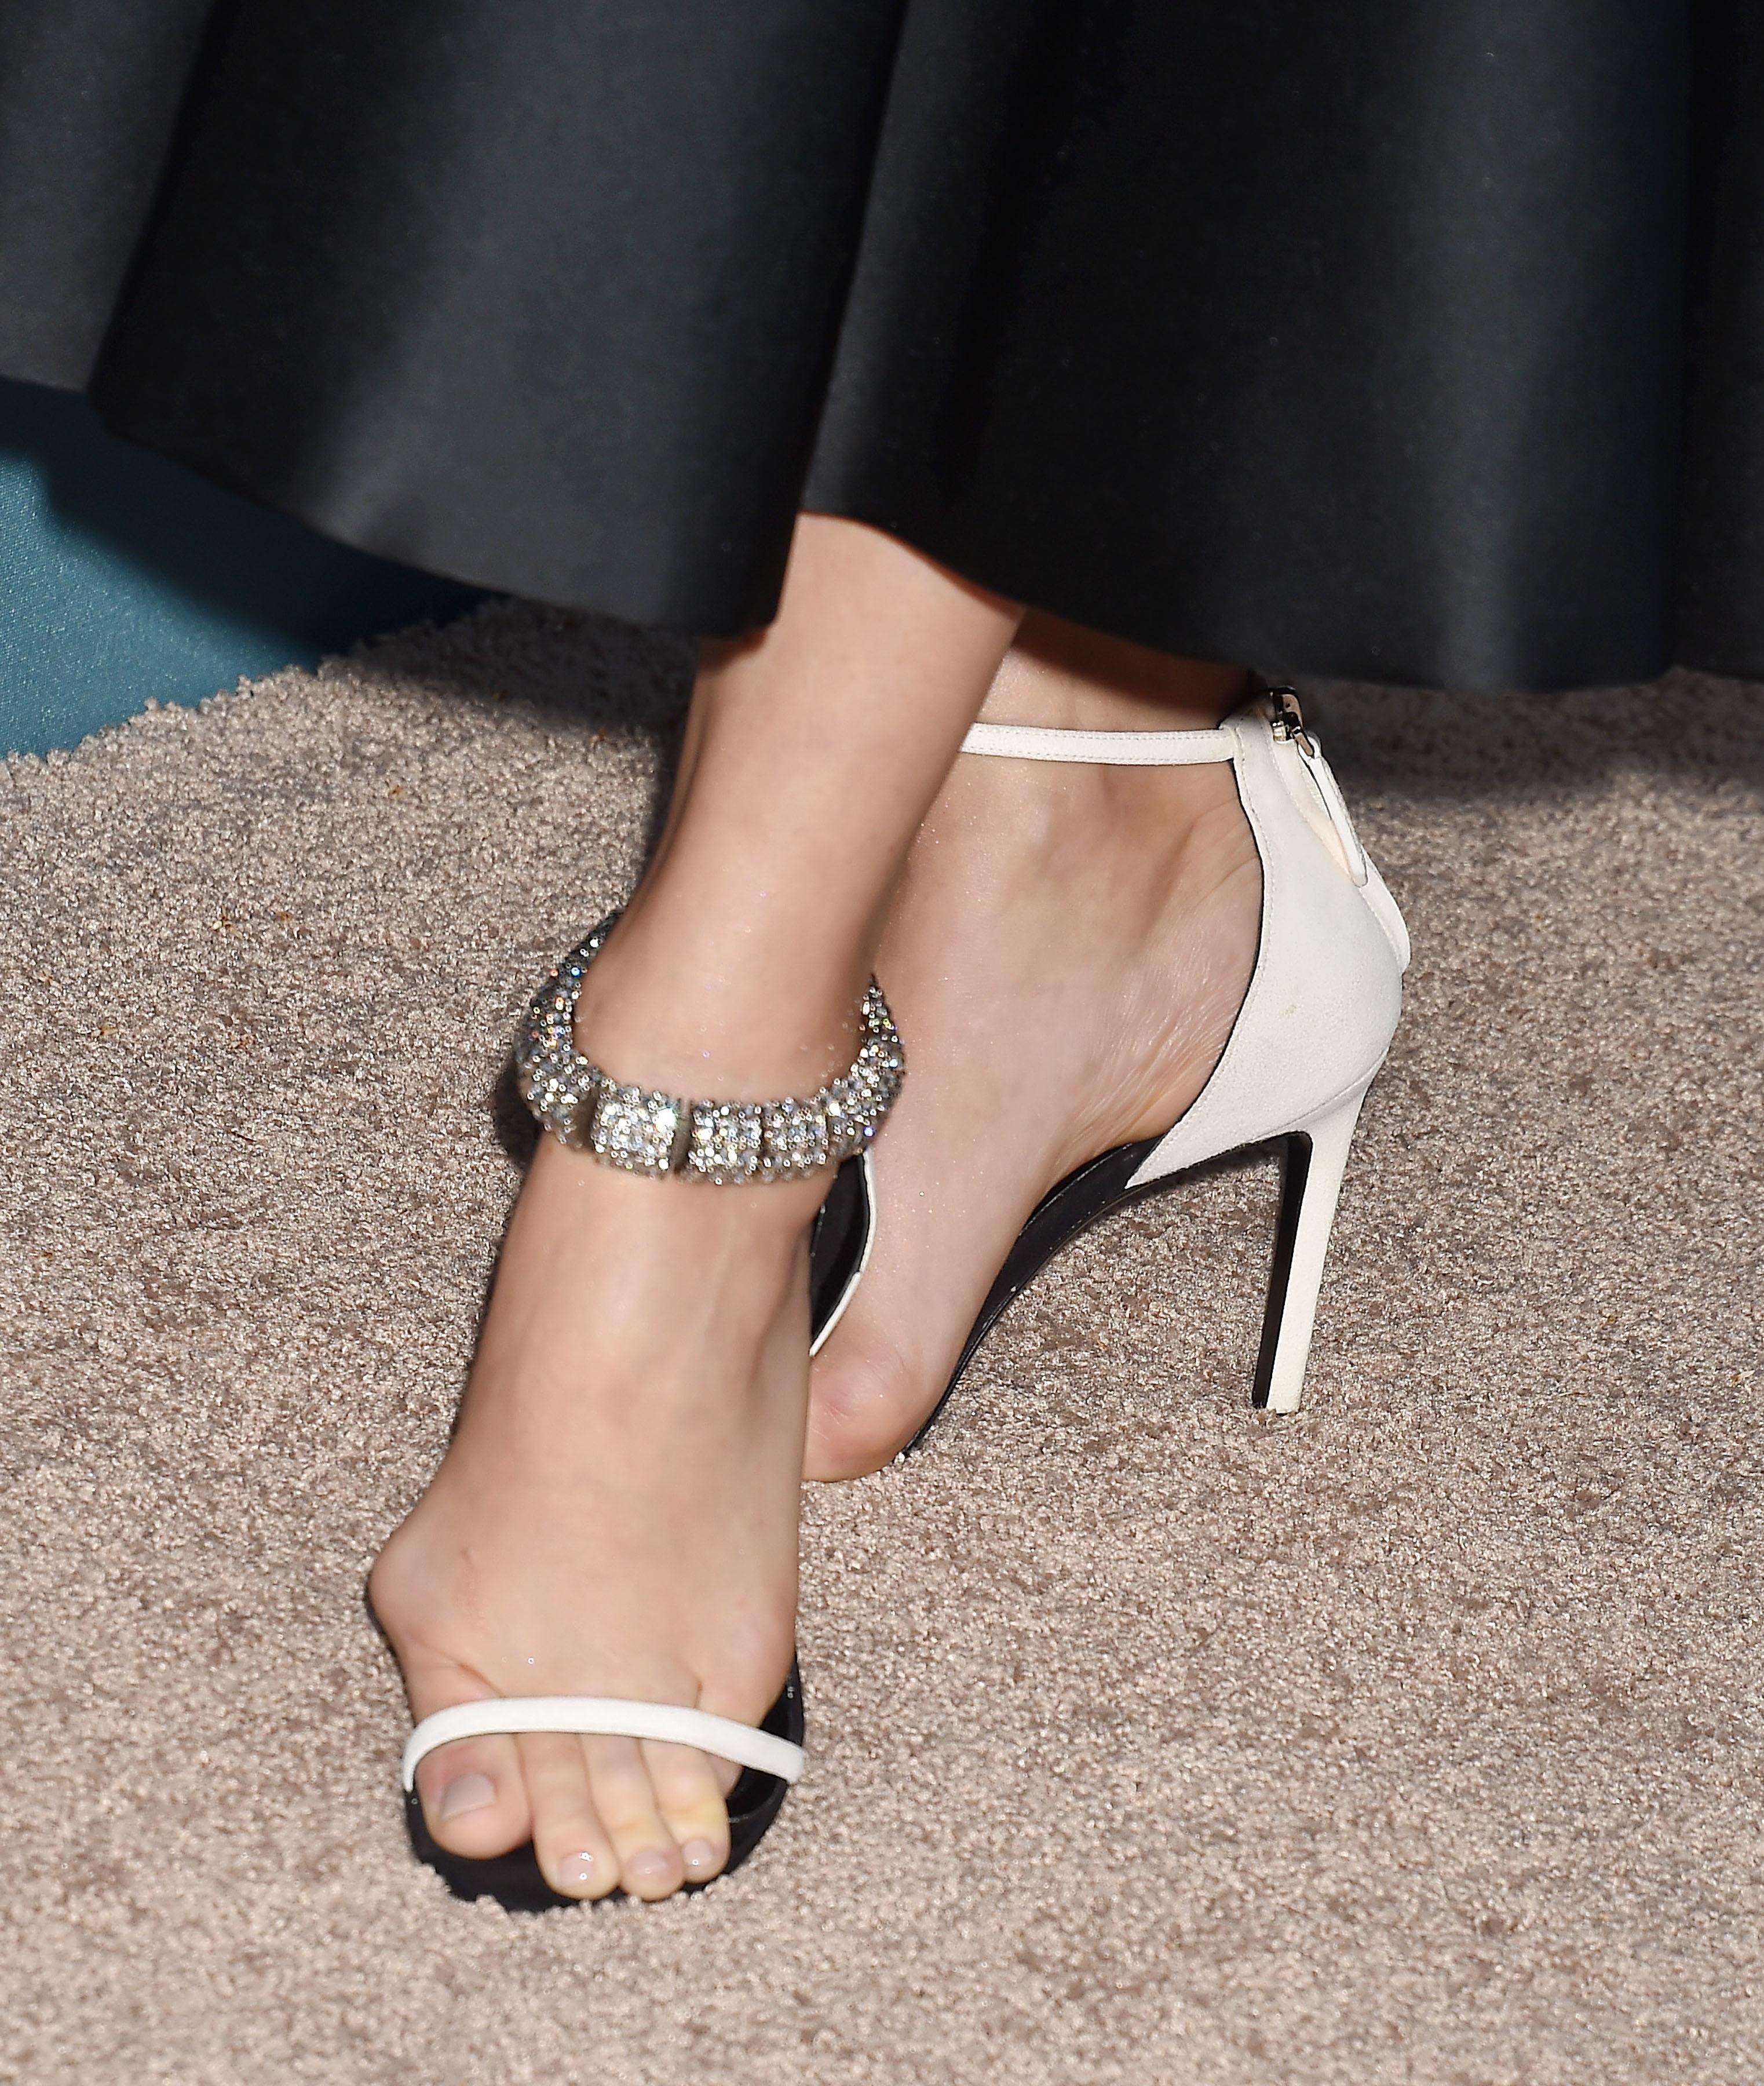 Amy Adams Wikifeet najružnija celebrity stopala - stranica 44 - forum.hr